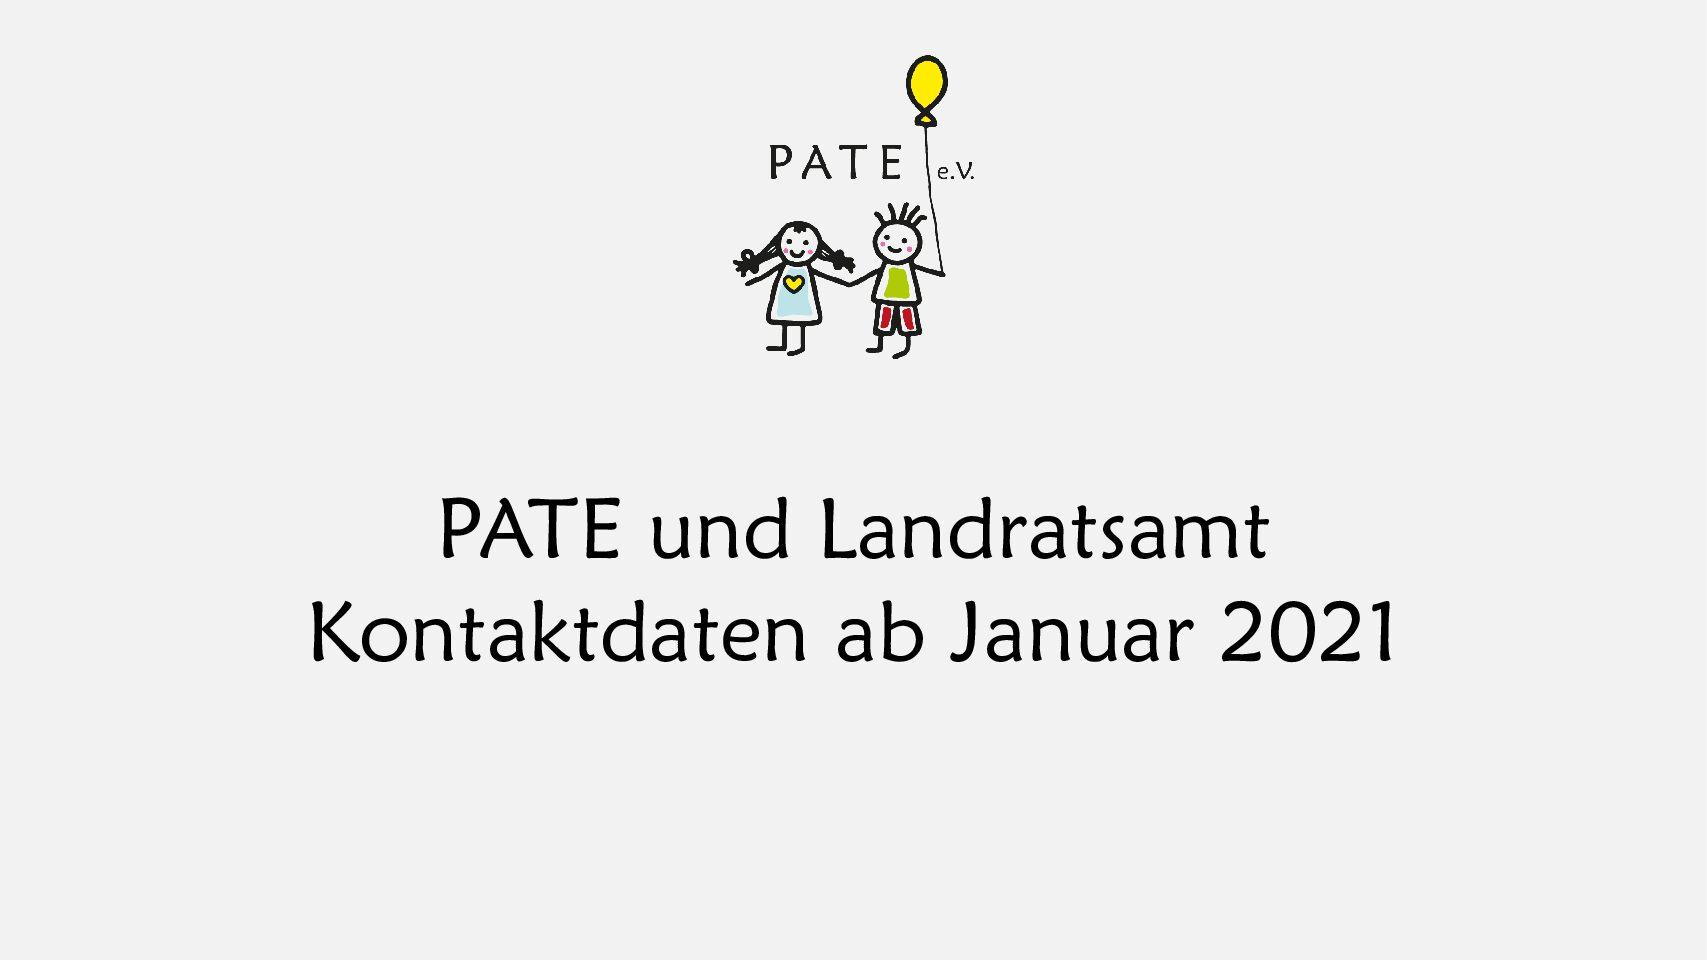 PATE und Landratsamt Kontaktdaten ab Januar 2021